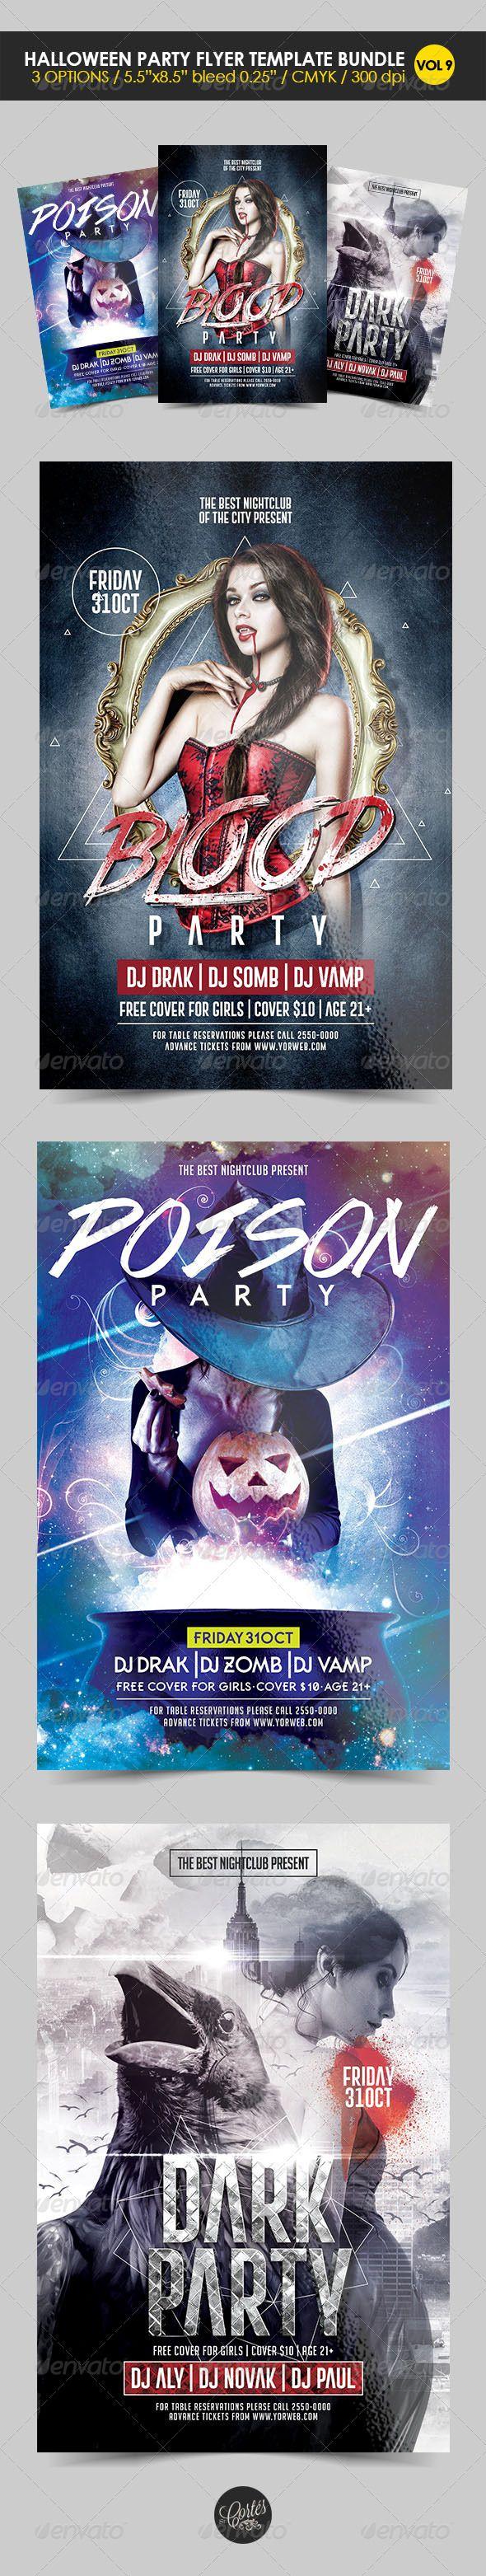 Halloween Party Flyer Template Bundle Vol. 9 | Halloween party ...